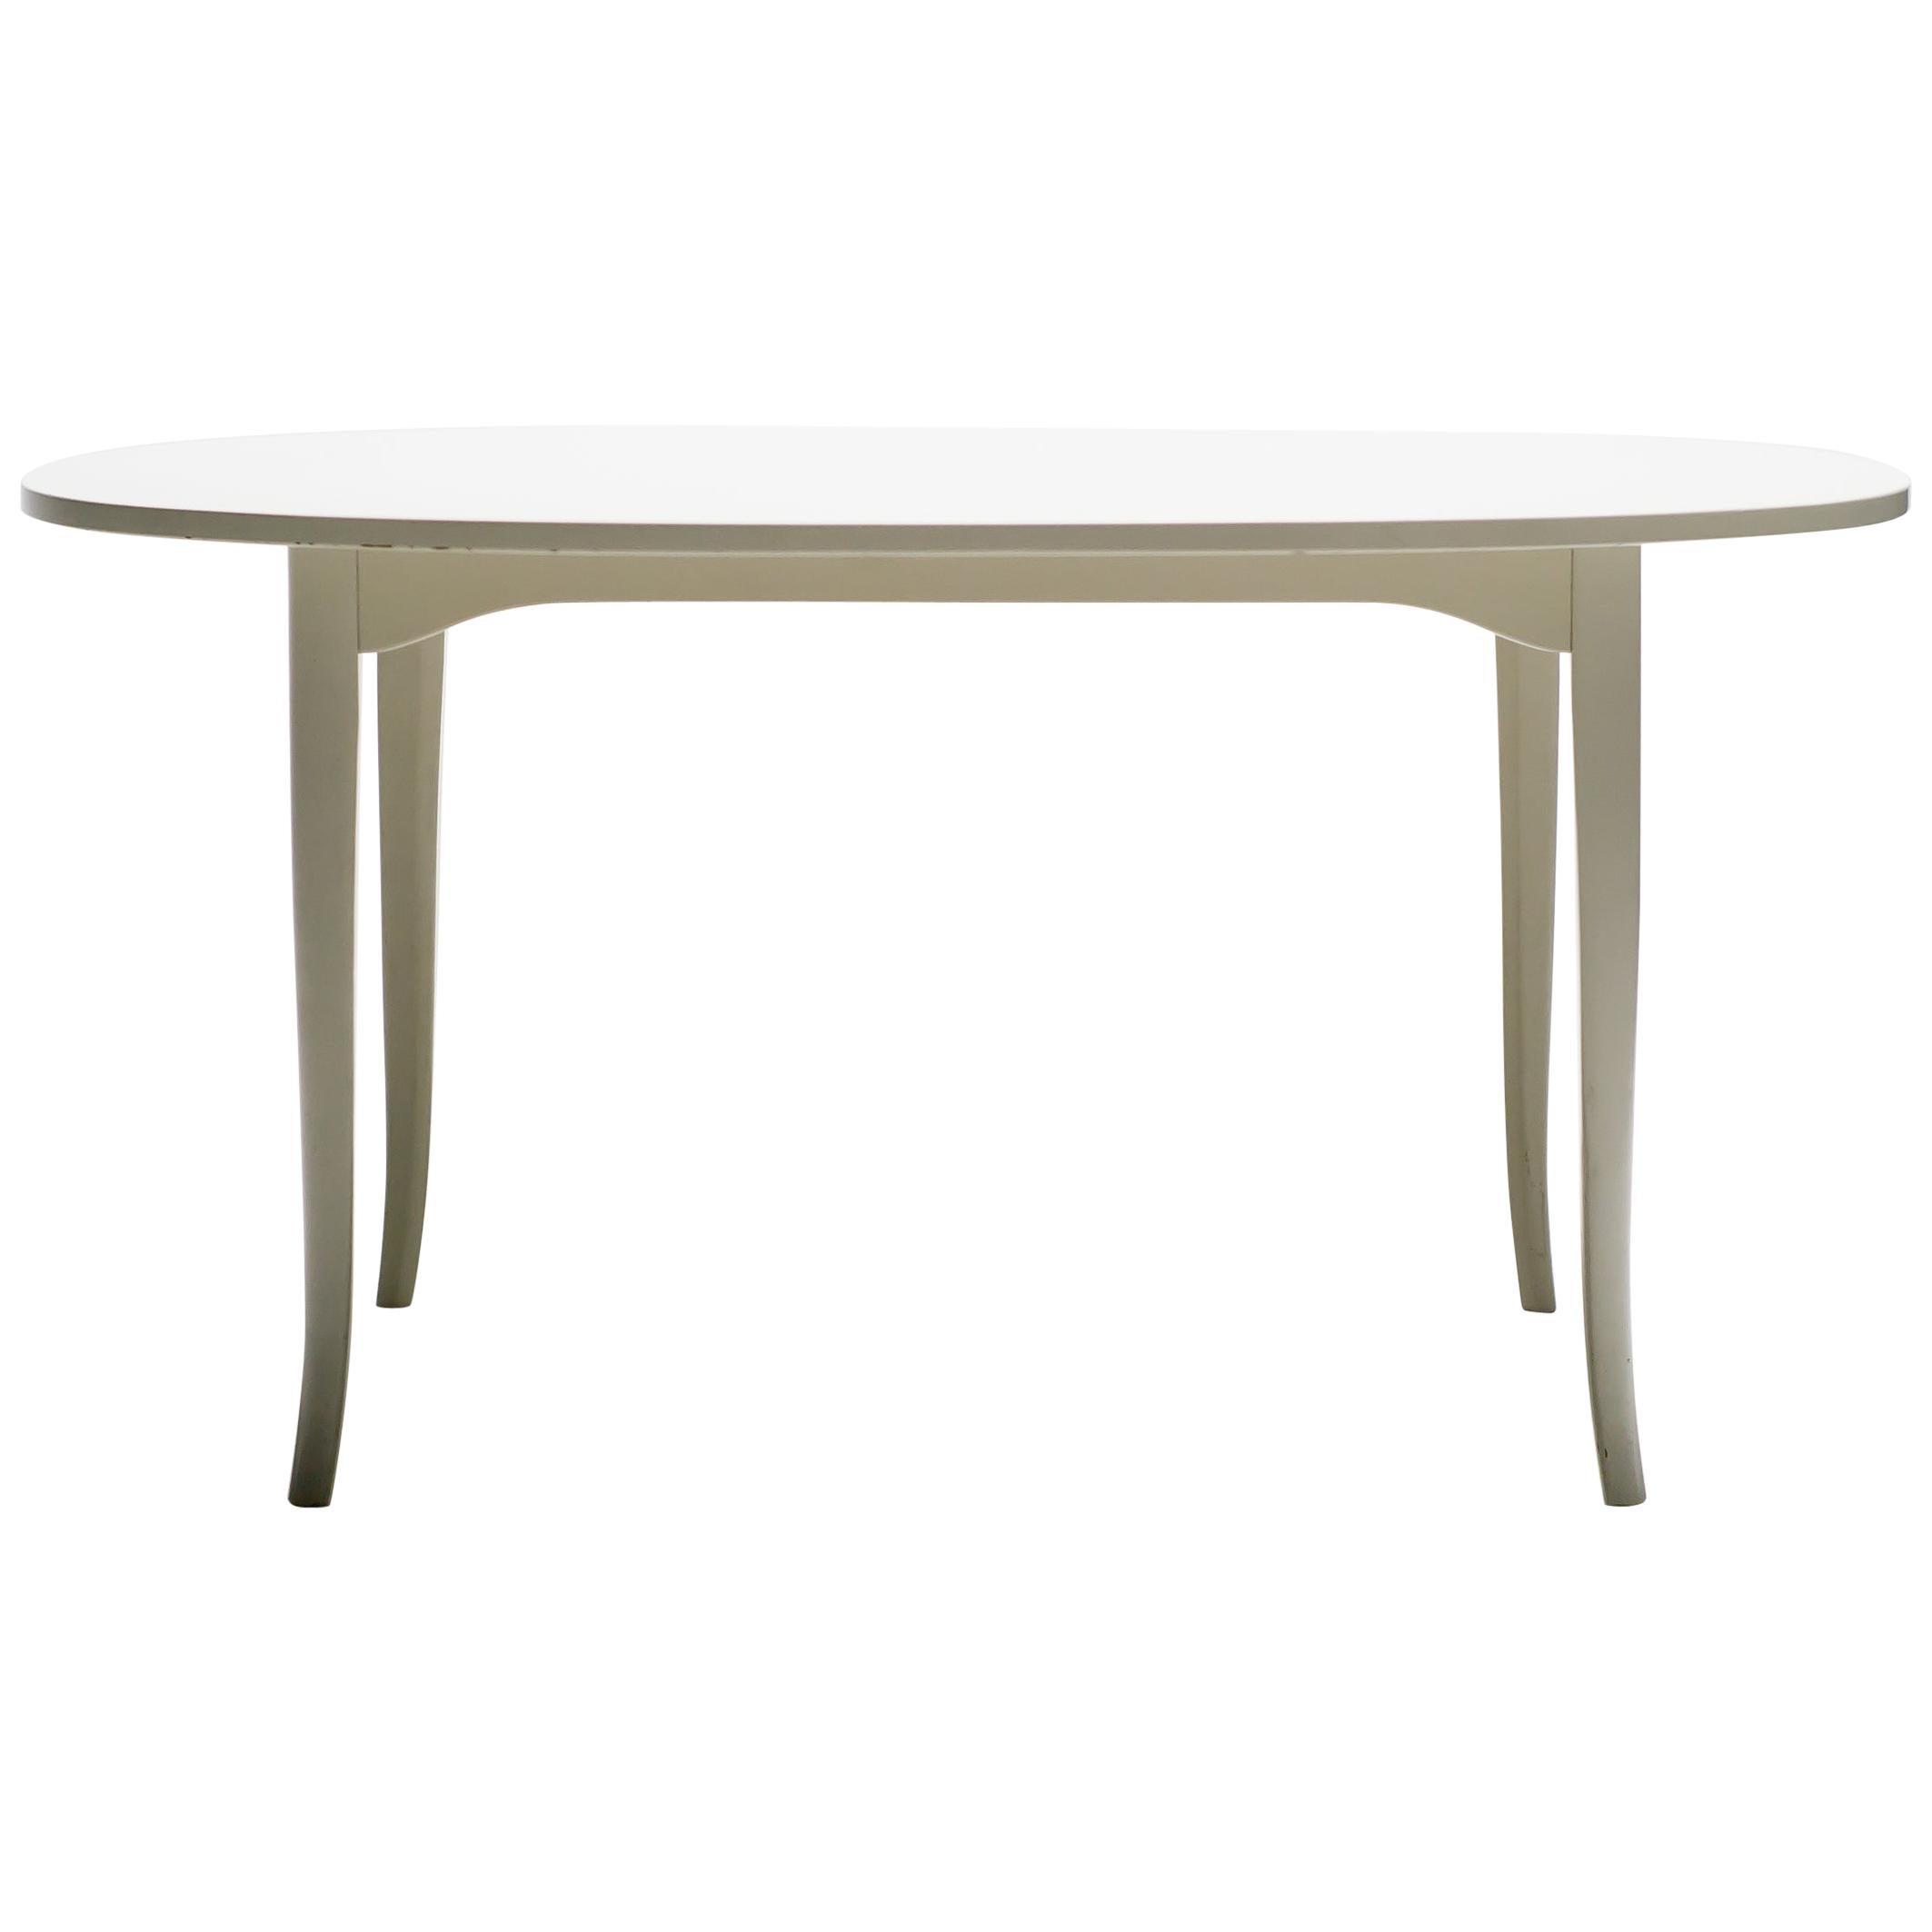 Carl Malmsten Furniture 142 For Sale At 1stdibs